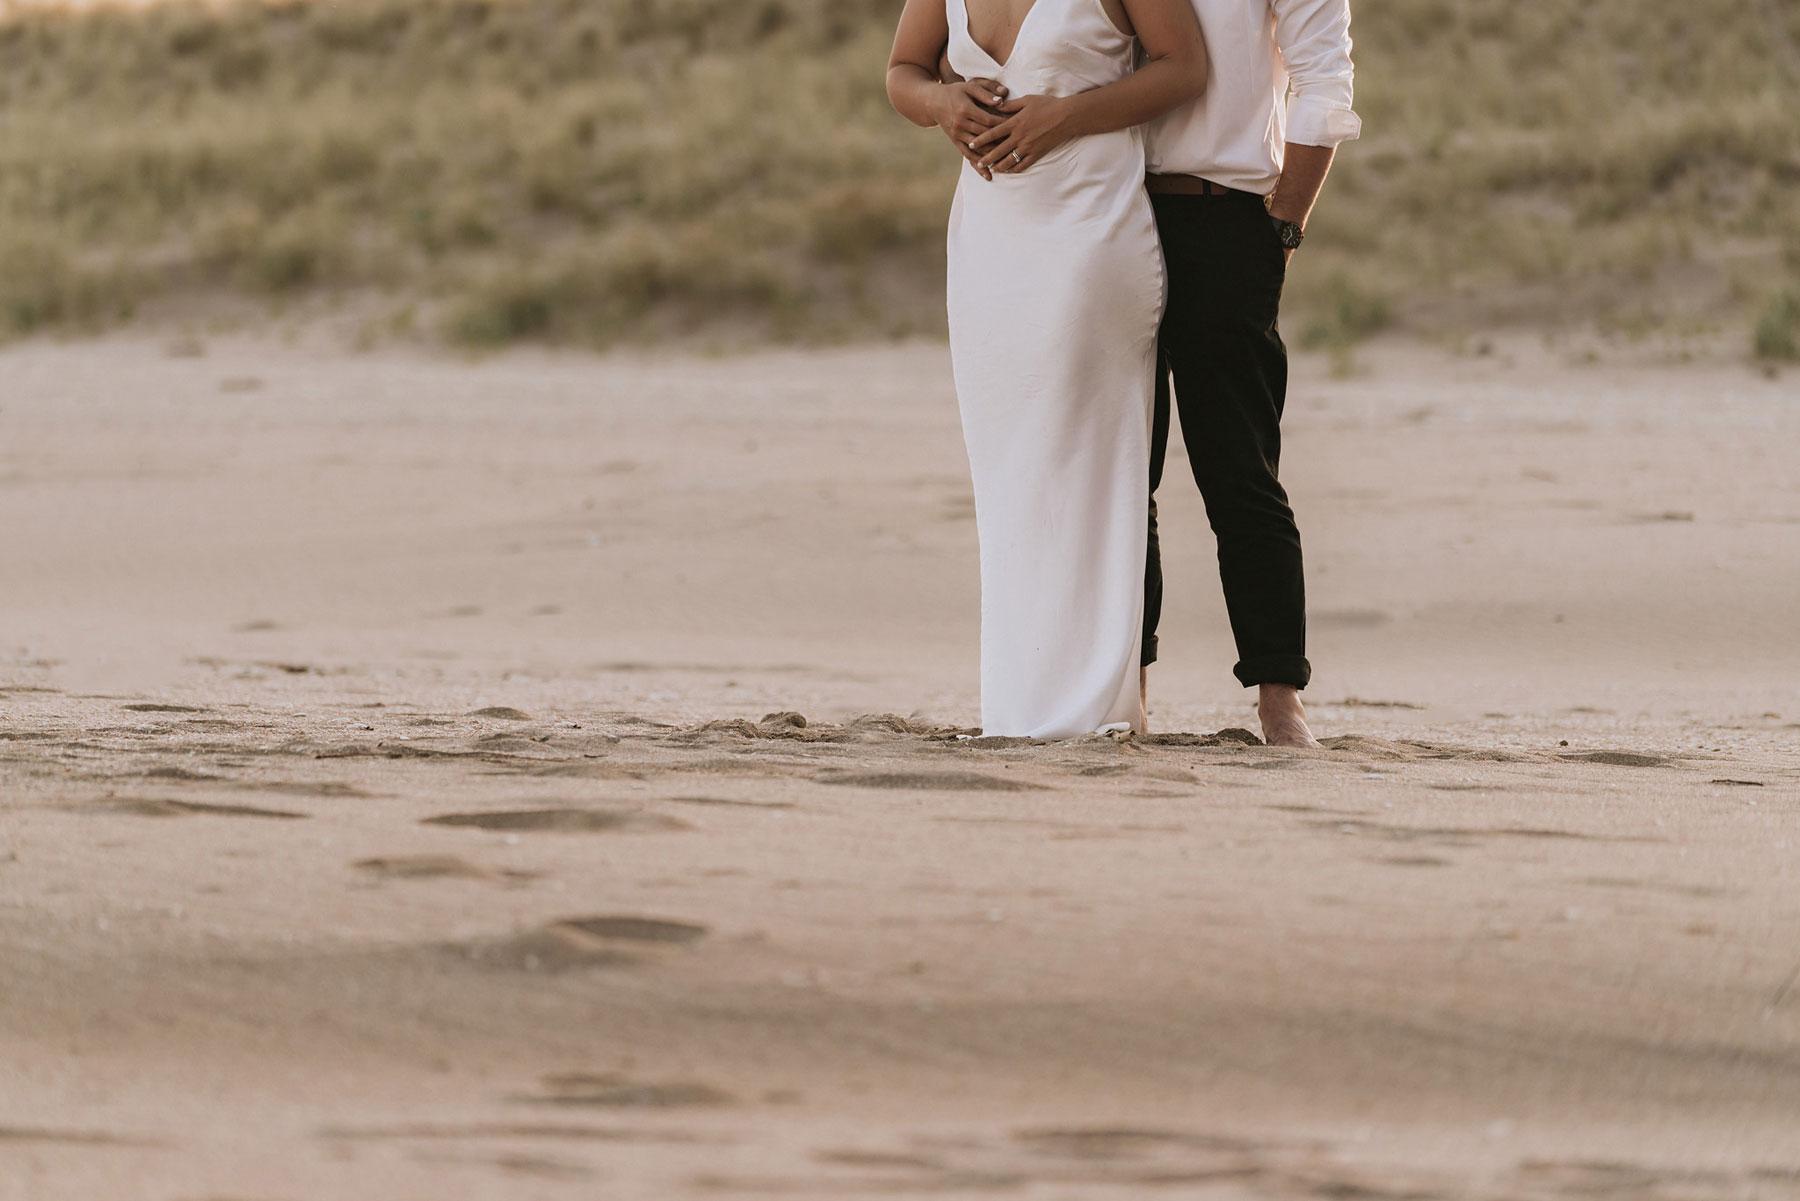 newfound-j-n-orua-beach-house-coromandel-wedding-photographers-738